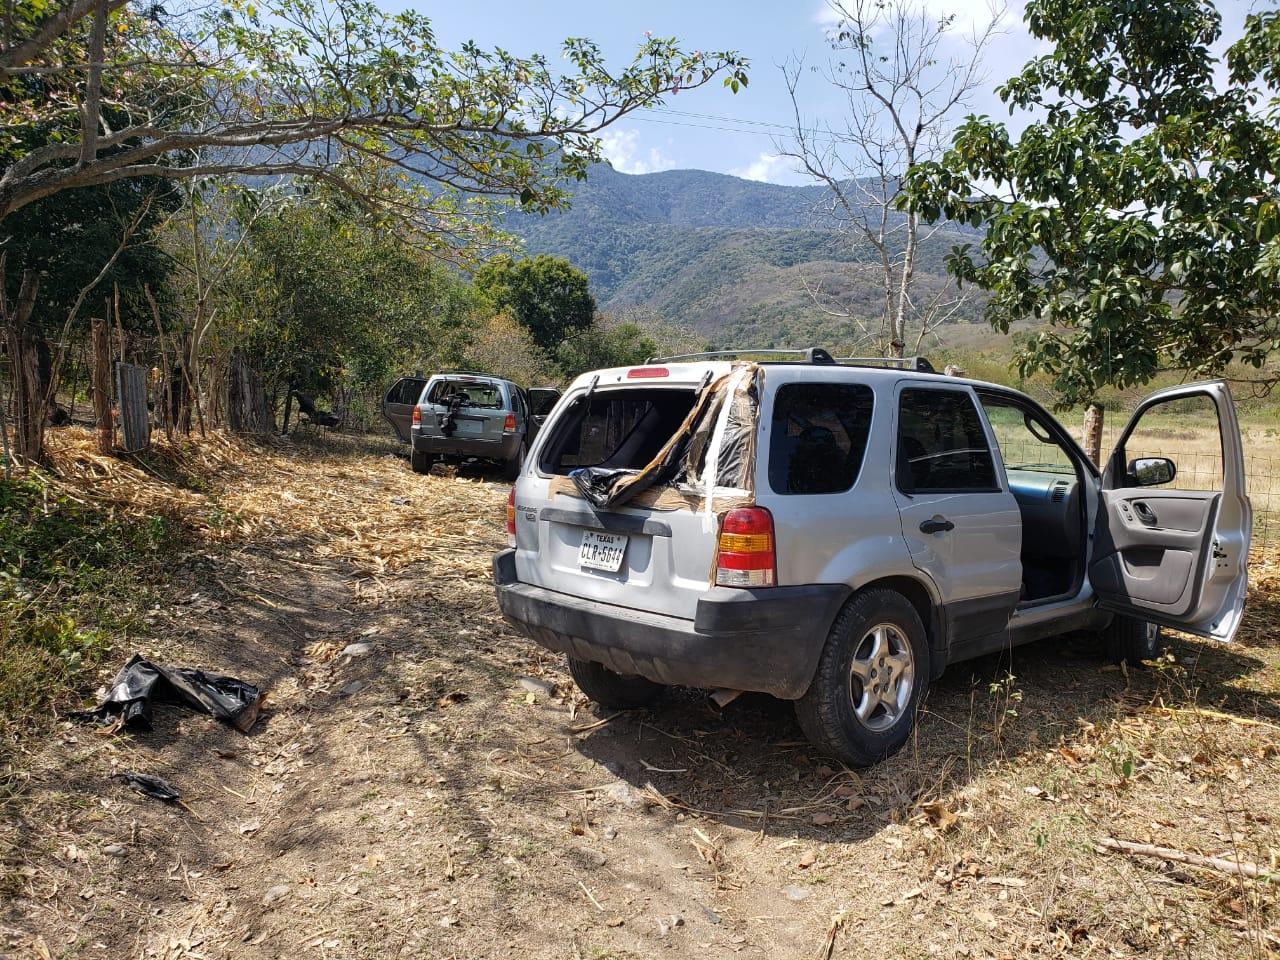 Sicarios del CDN atacan a Guardia Nacional pero terminan huyendo; les decomisan trocas y armas